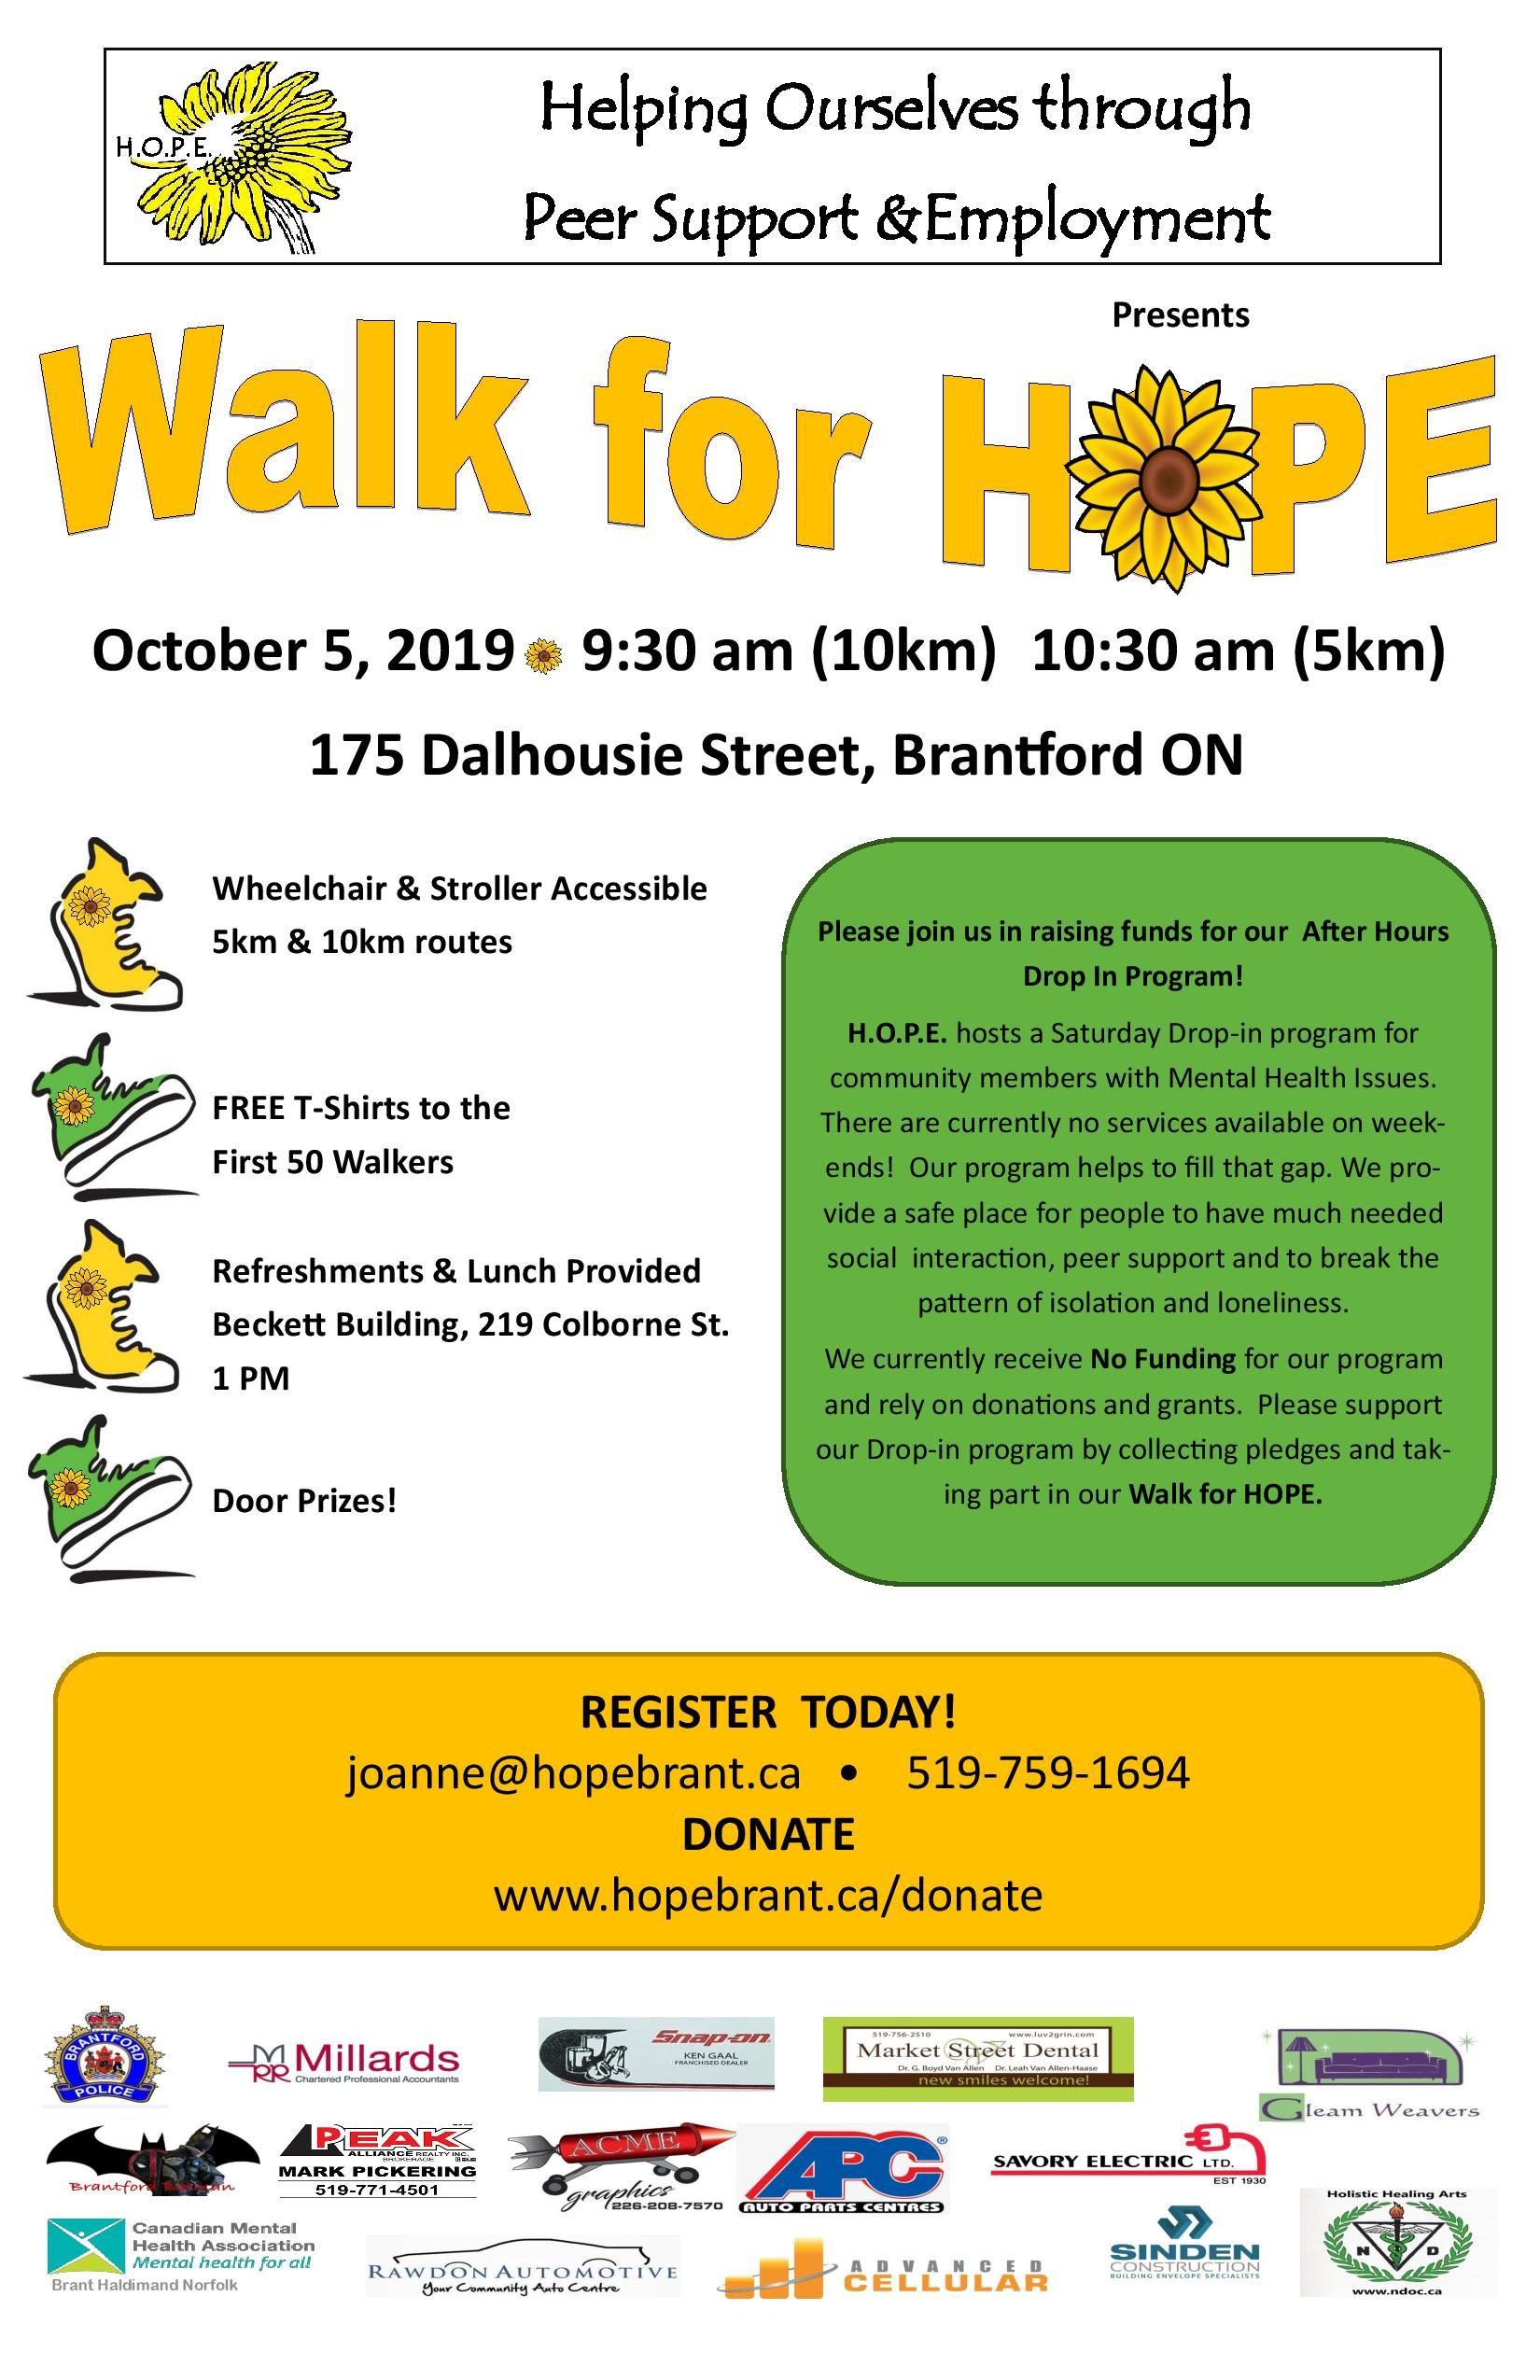 Walk for HOPE, Saturday, October 5, 2019 | CMHA Brant